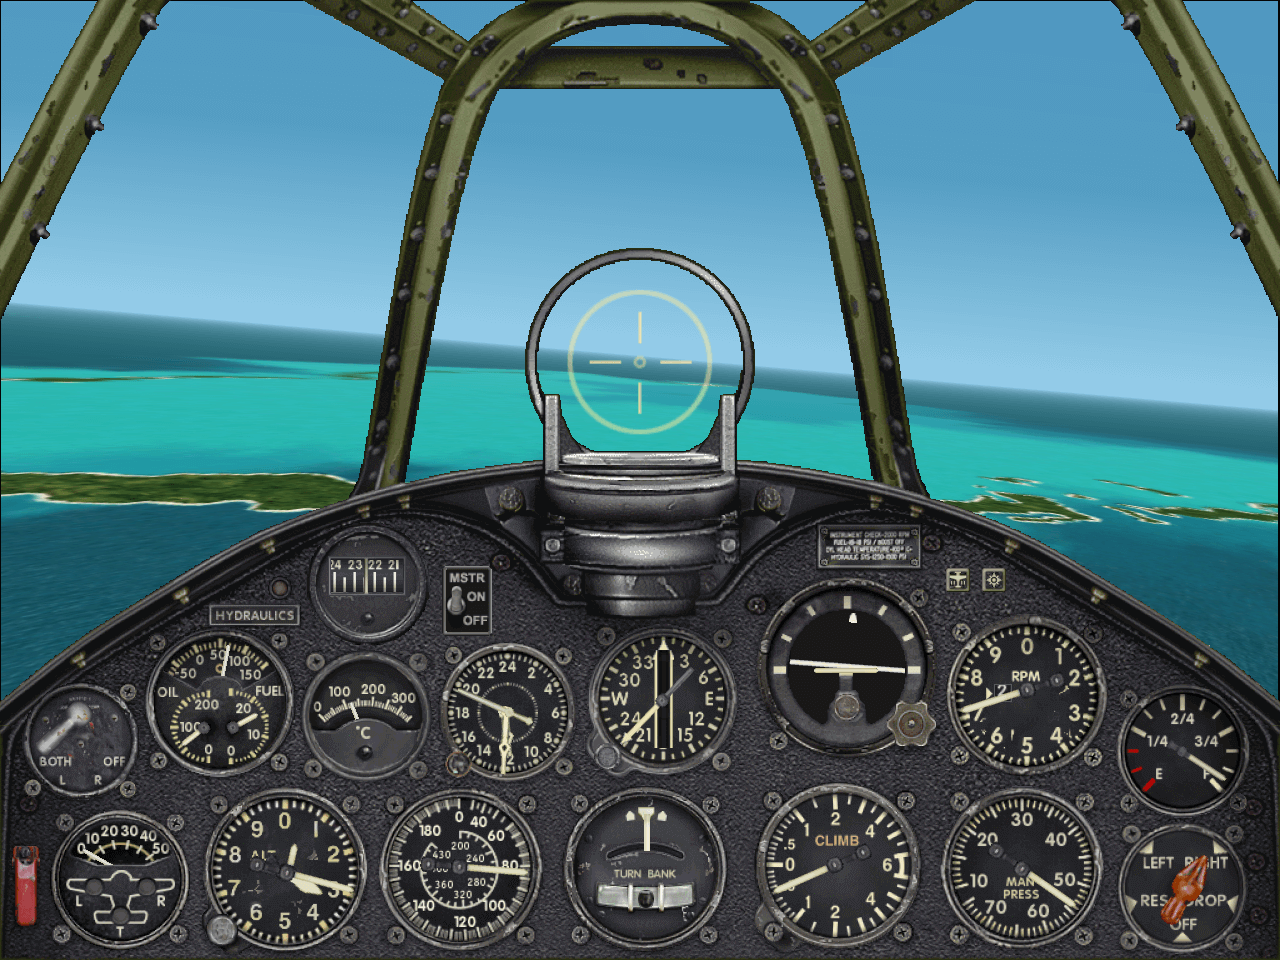 Ww2 Aircraft Simulator - The Best Aircraft Of 2018